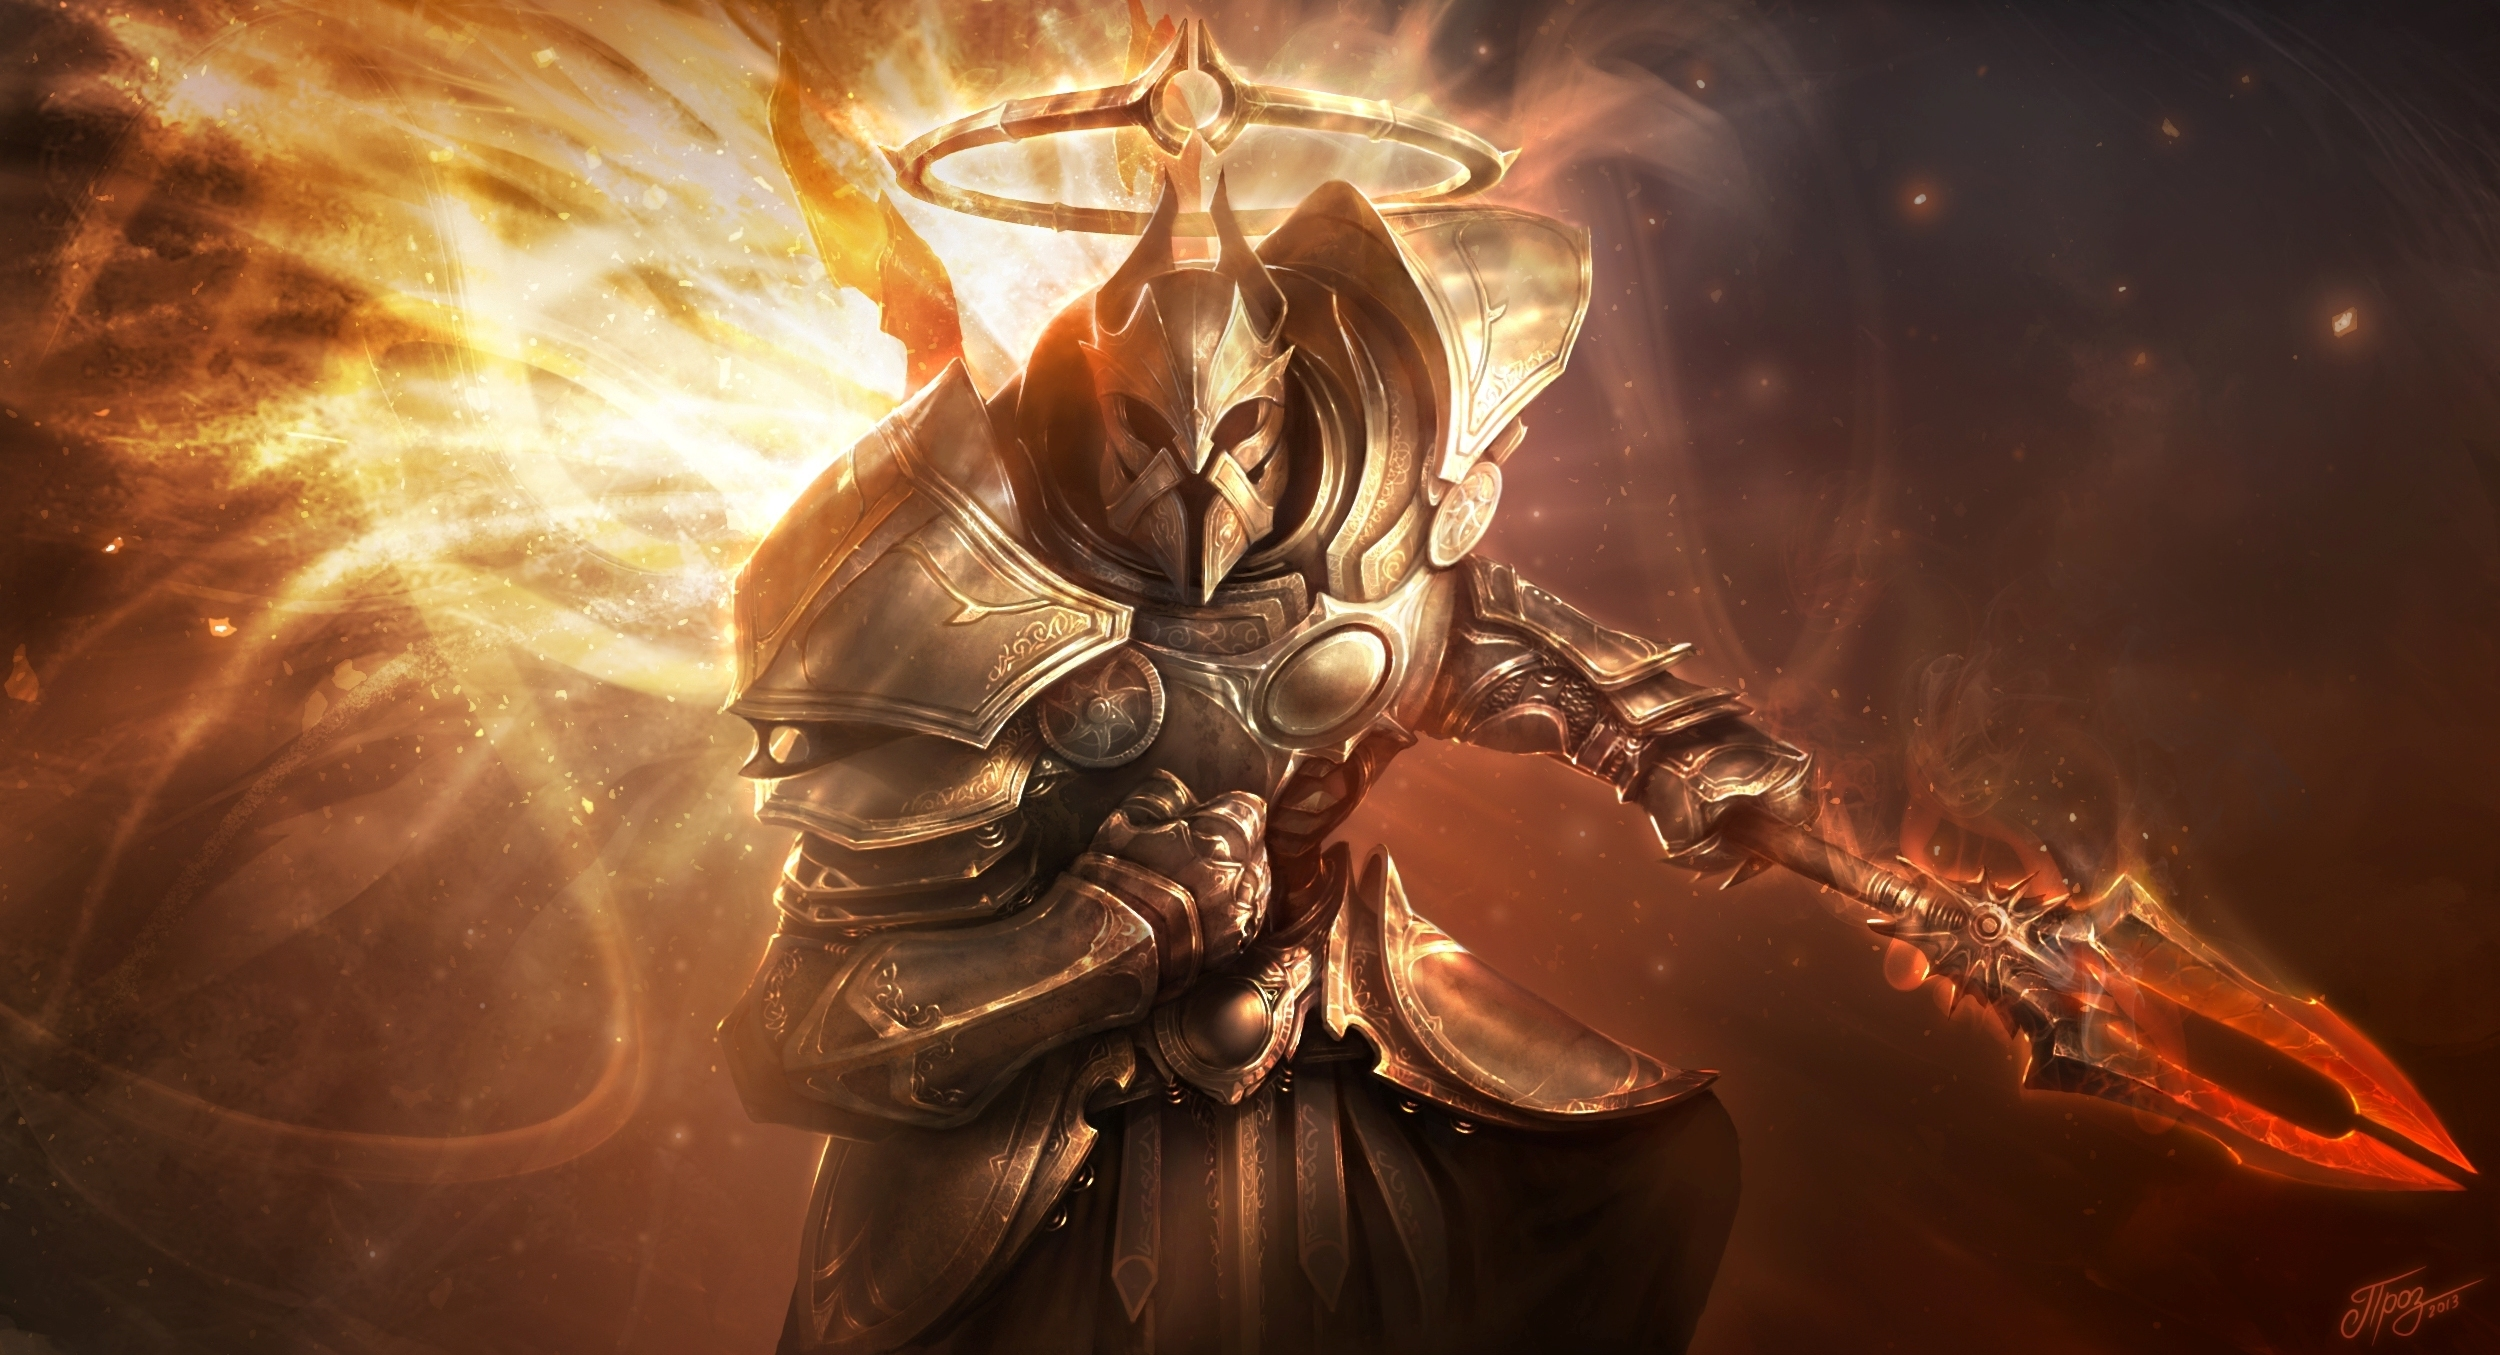 Warrior Fantasy Art Armor Angel Magic Wallpapers Hd: Warriors Armor Helmet Fantasy Warrior Knight Knights Magic